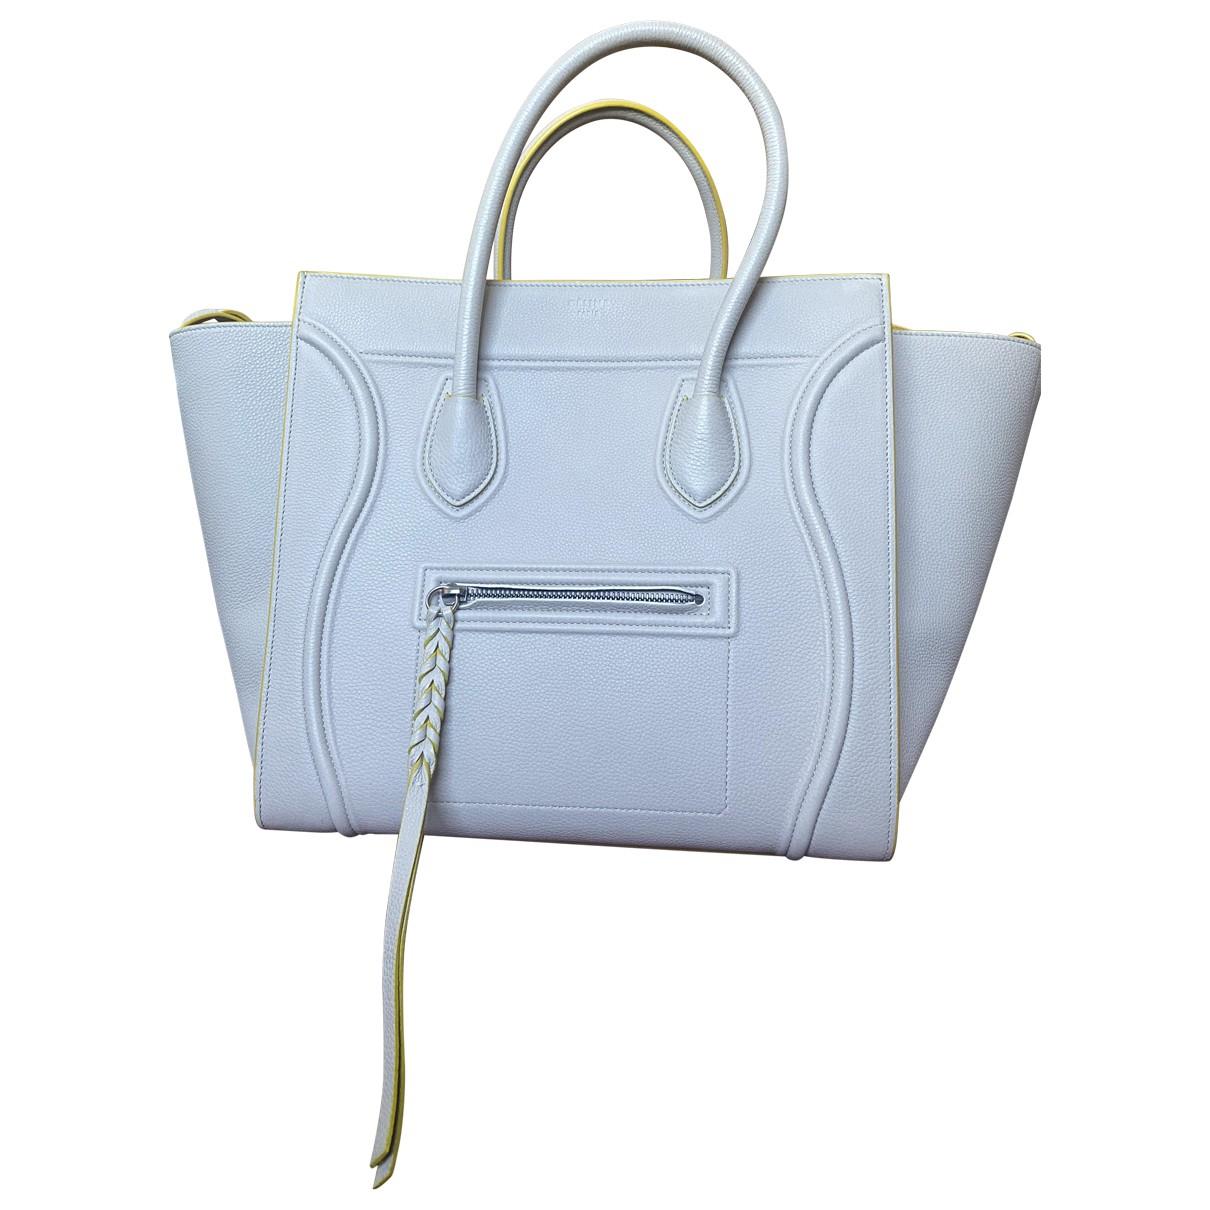 Celine - Sac a main Luggage Phantom pour femme en cuir - beige